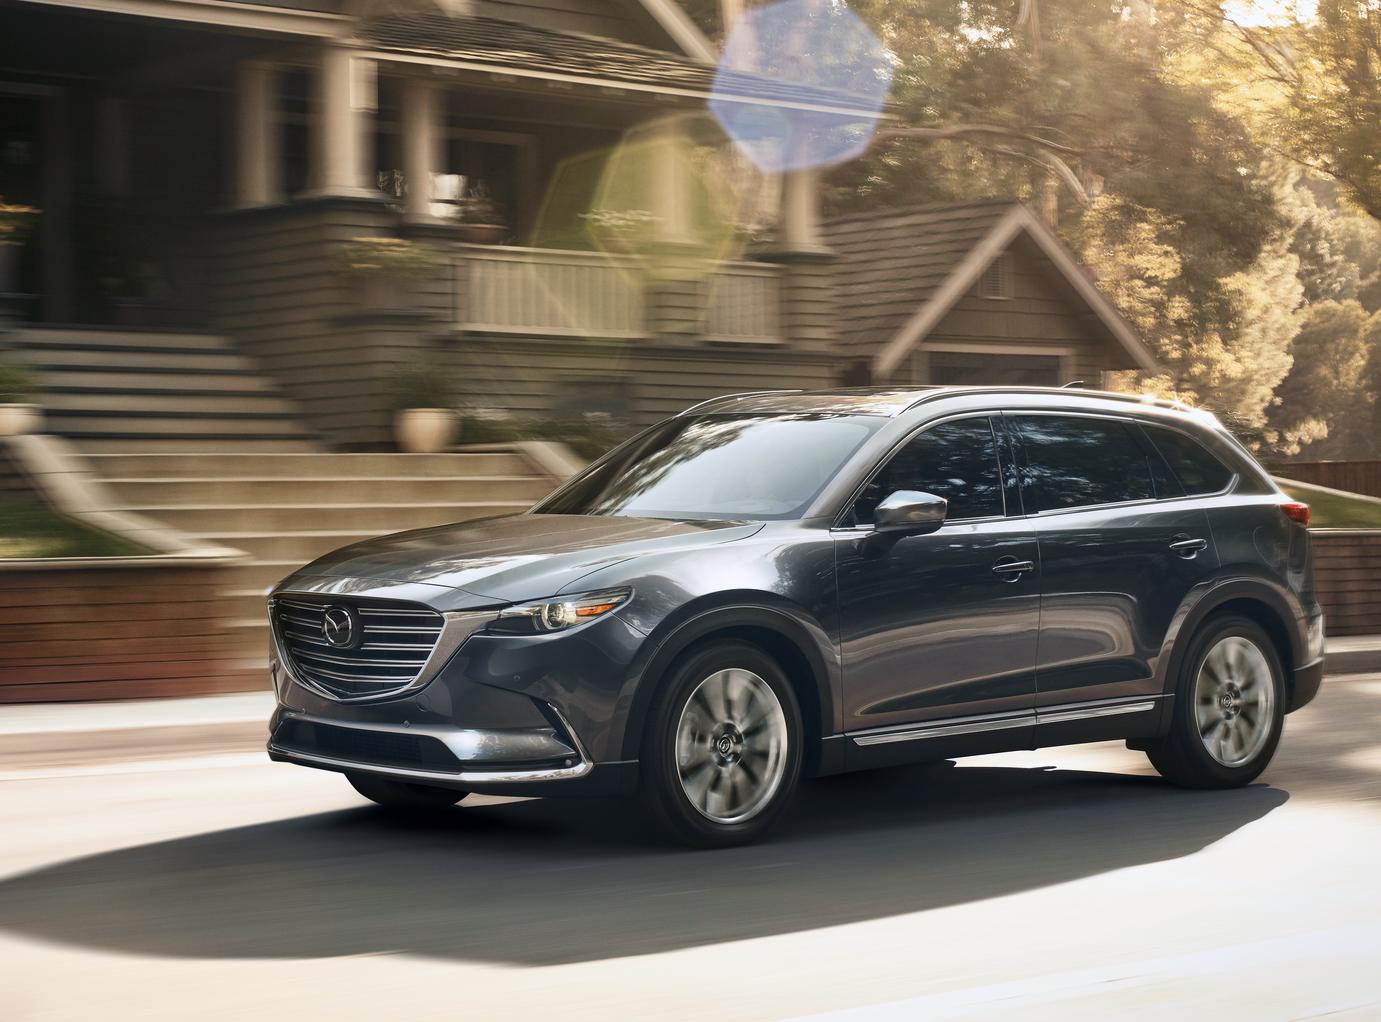 2019 Mazda CX-9 features